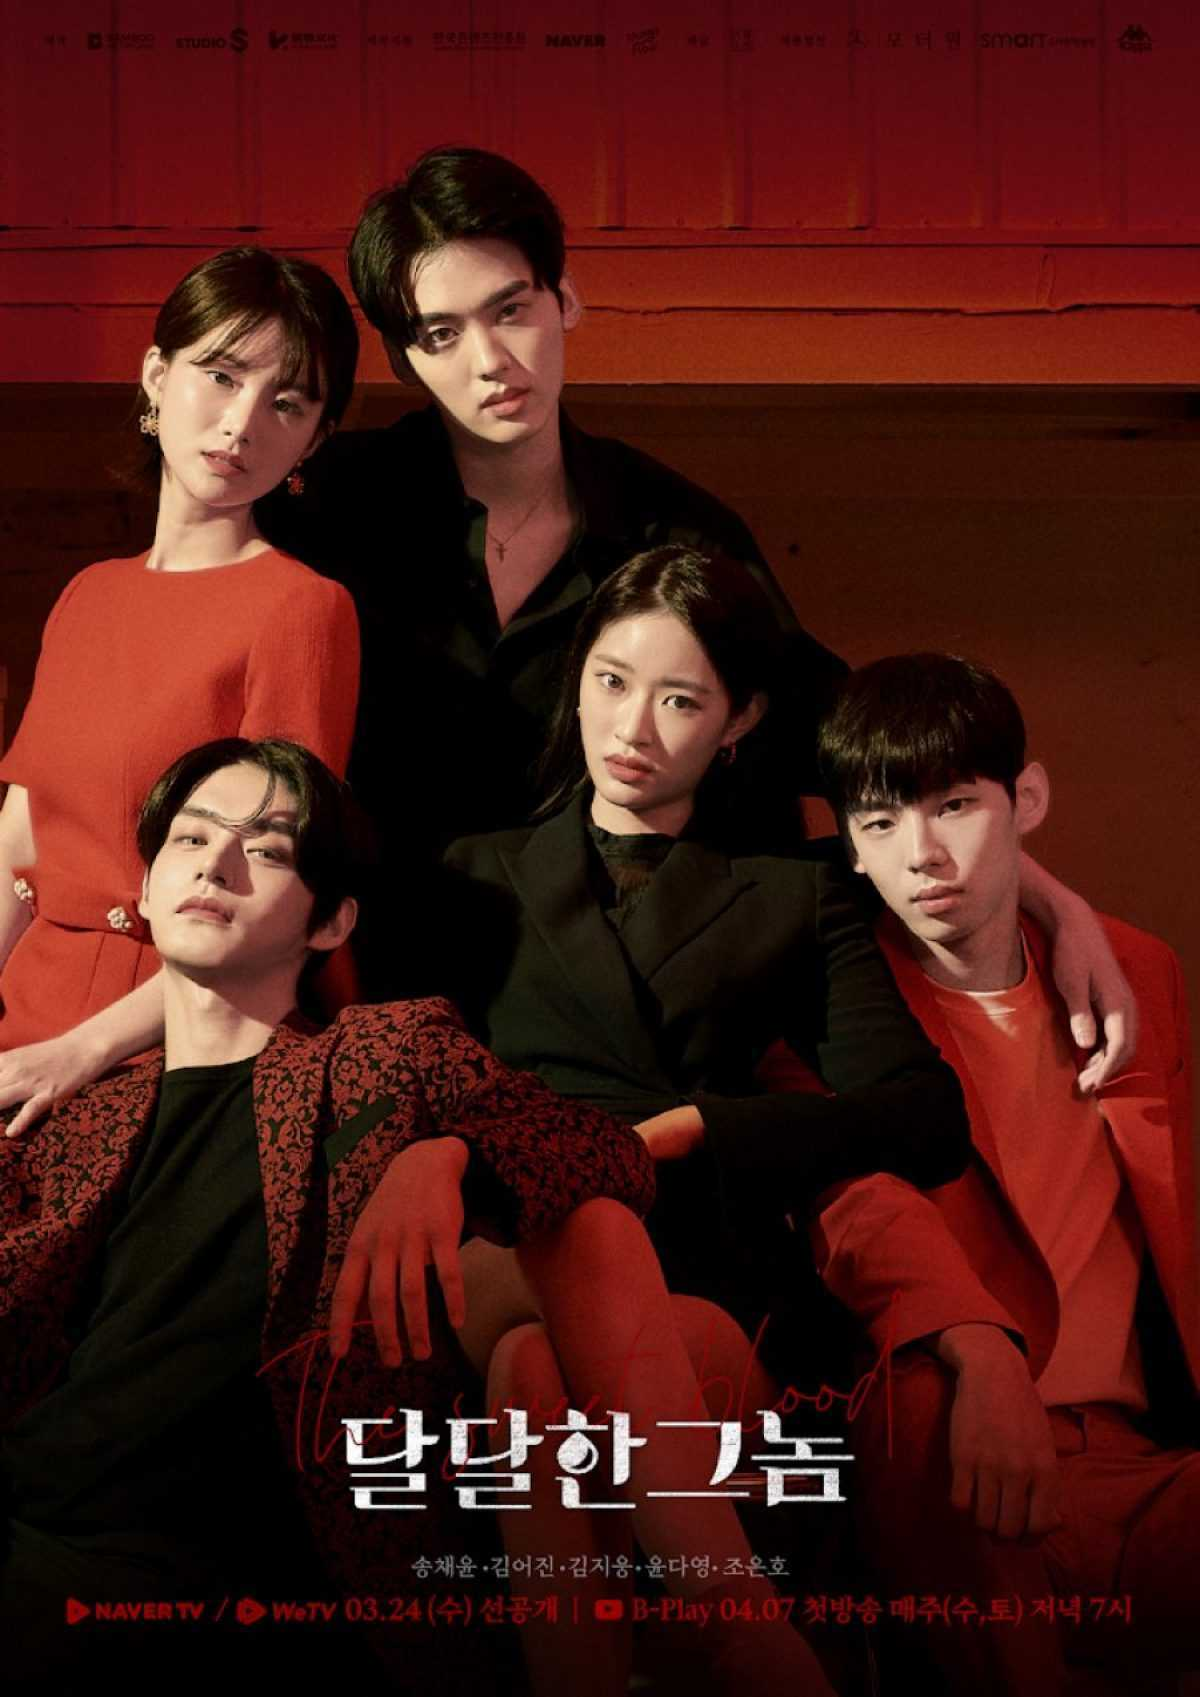 the-sweet-blood-2021-ซับไทย-ตอนที่-1-15-จบ-